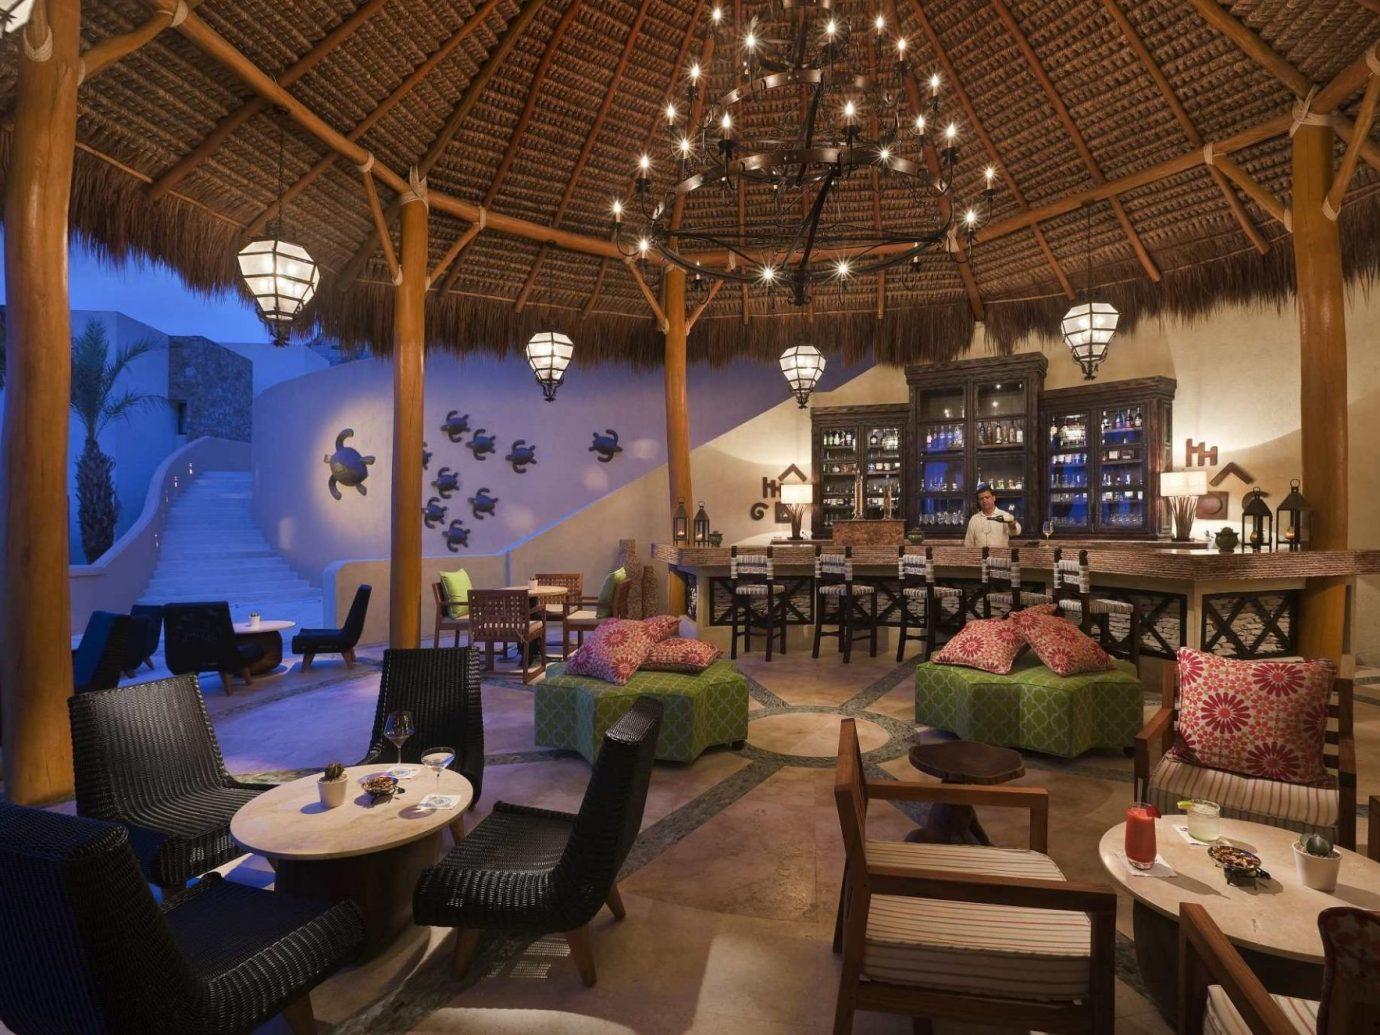 Beach Honeymoon Hotels Mexico Romance Tulum indoor chair interior design restaurant furniture café living room area several